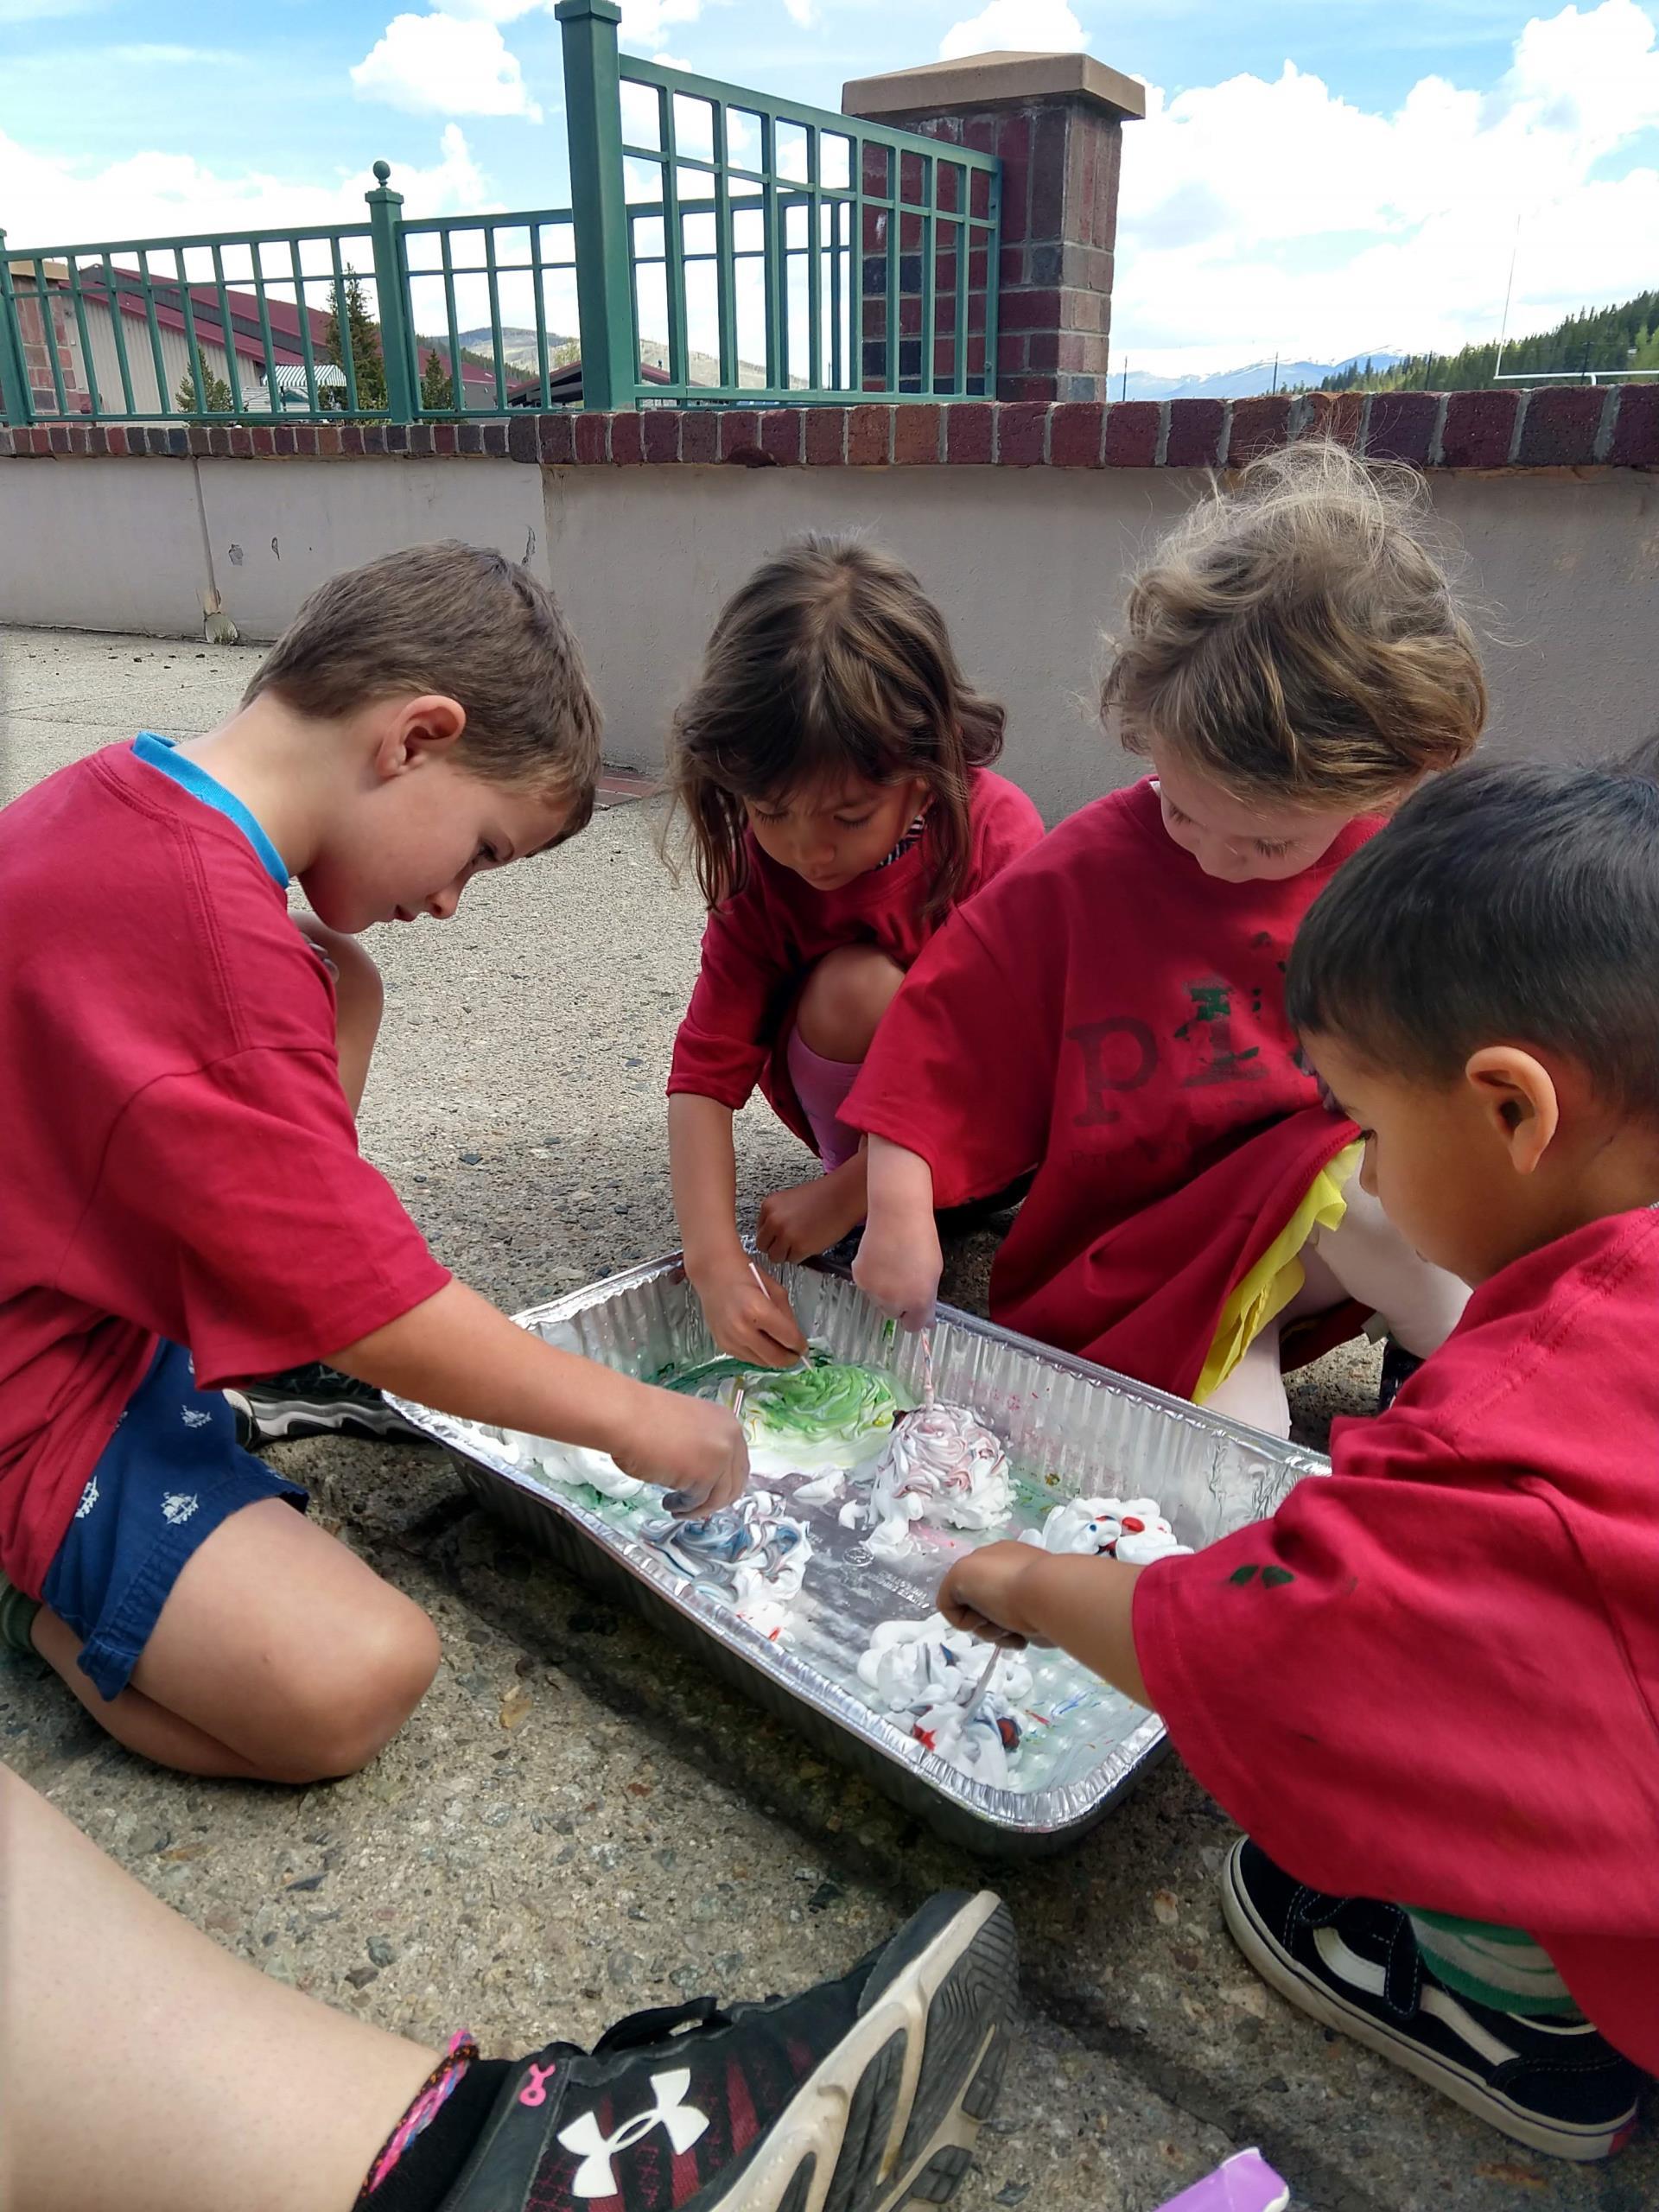 Four preschoolers working on craft